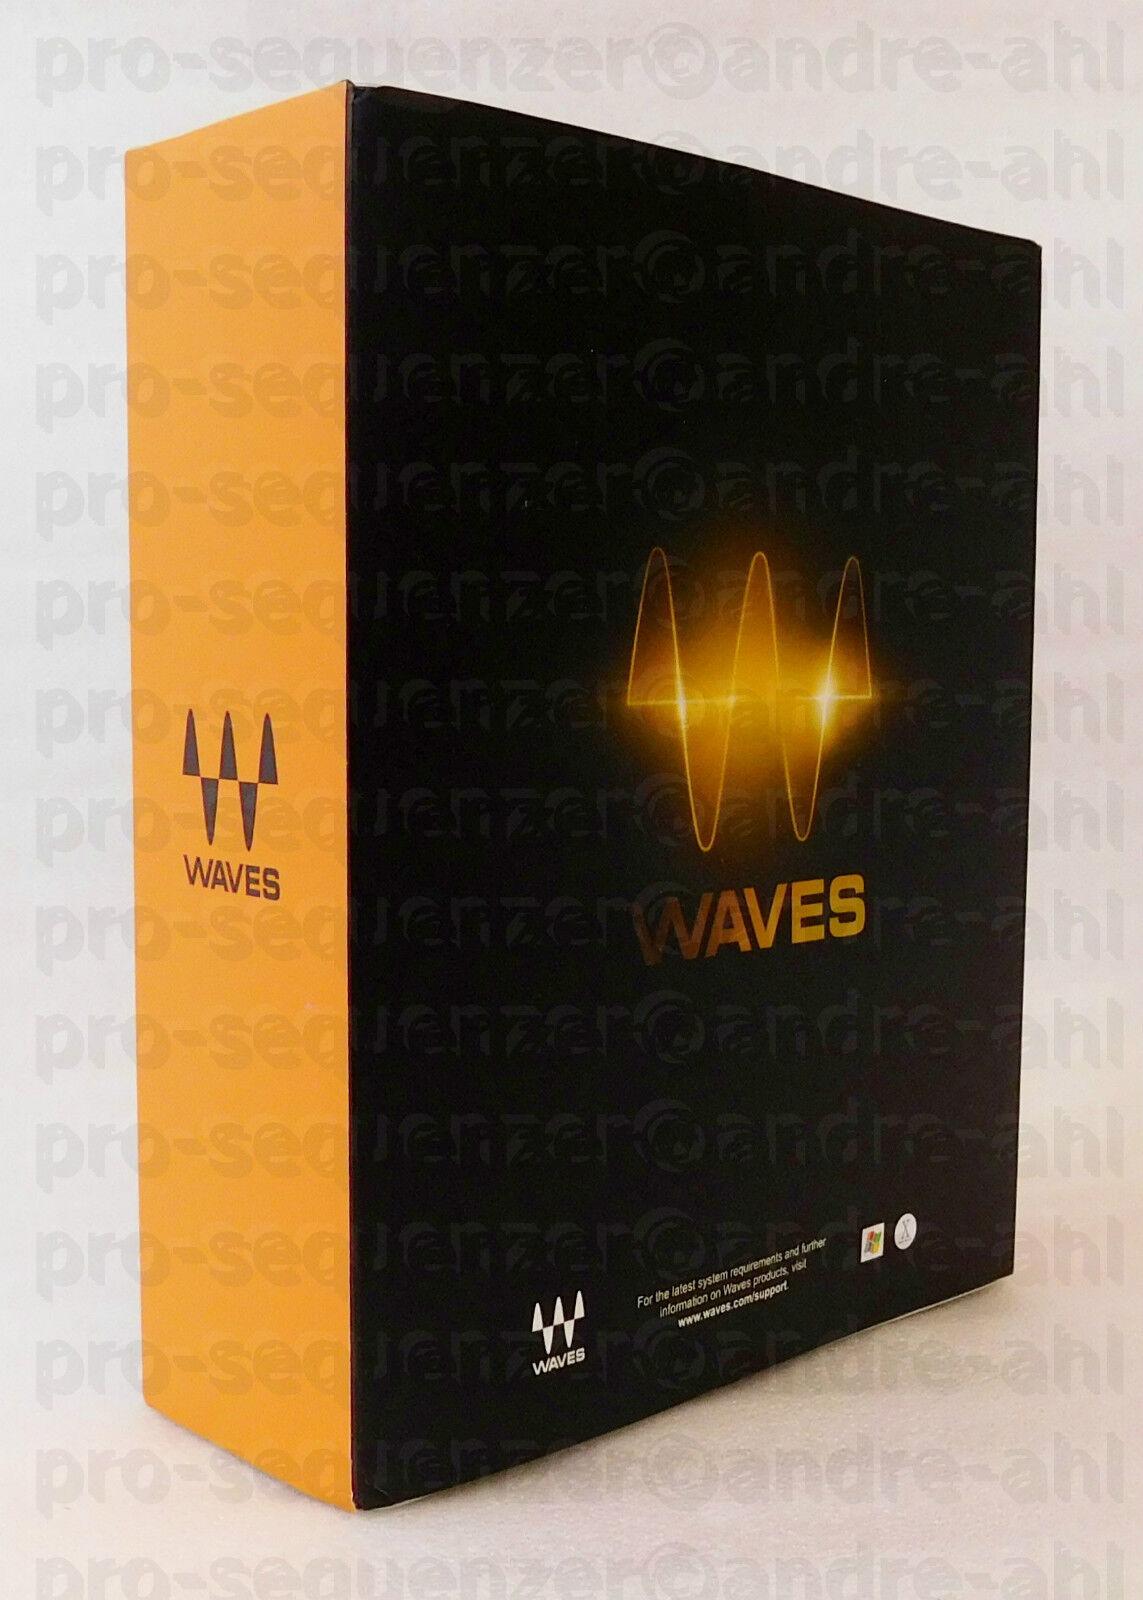 Waves Gold Bundle Native Box MAC   PC  WAVES Gold + NEU + Garantie